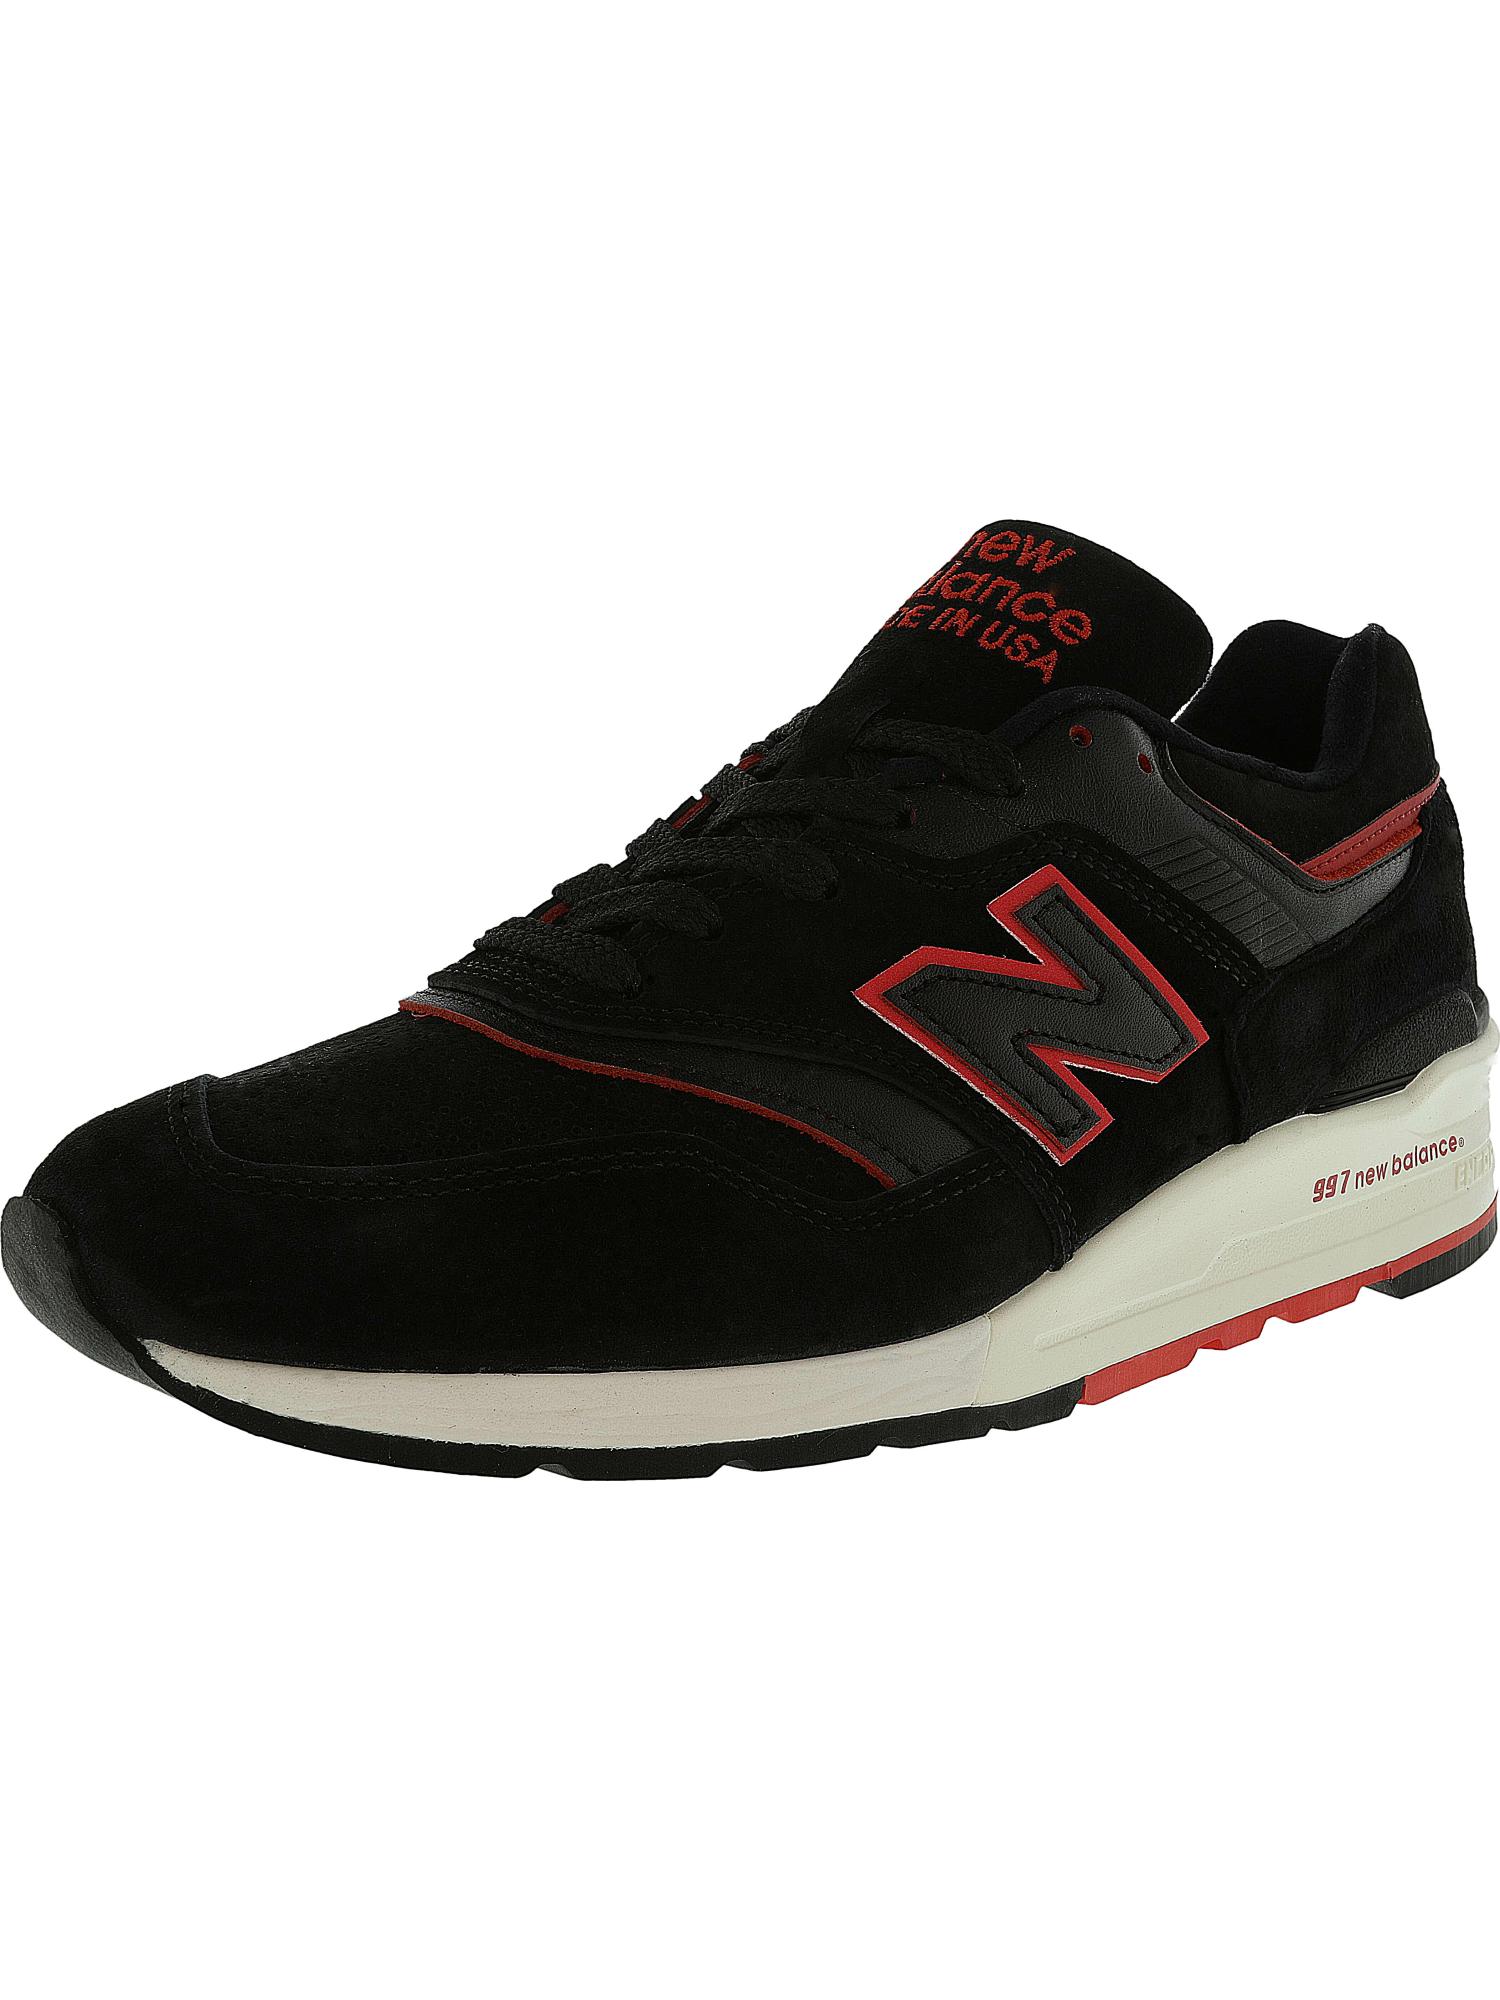 online store 4f151 5507c ... New Balance Men s M997 M997 M997 Ankle-High Fashion Sneaker e0a231 ...